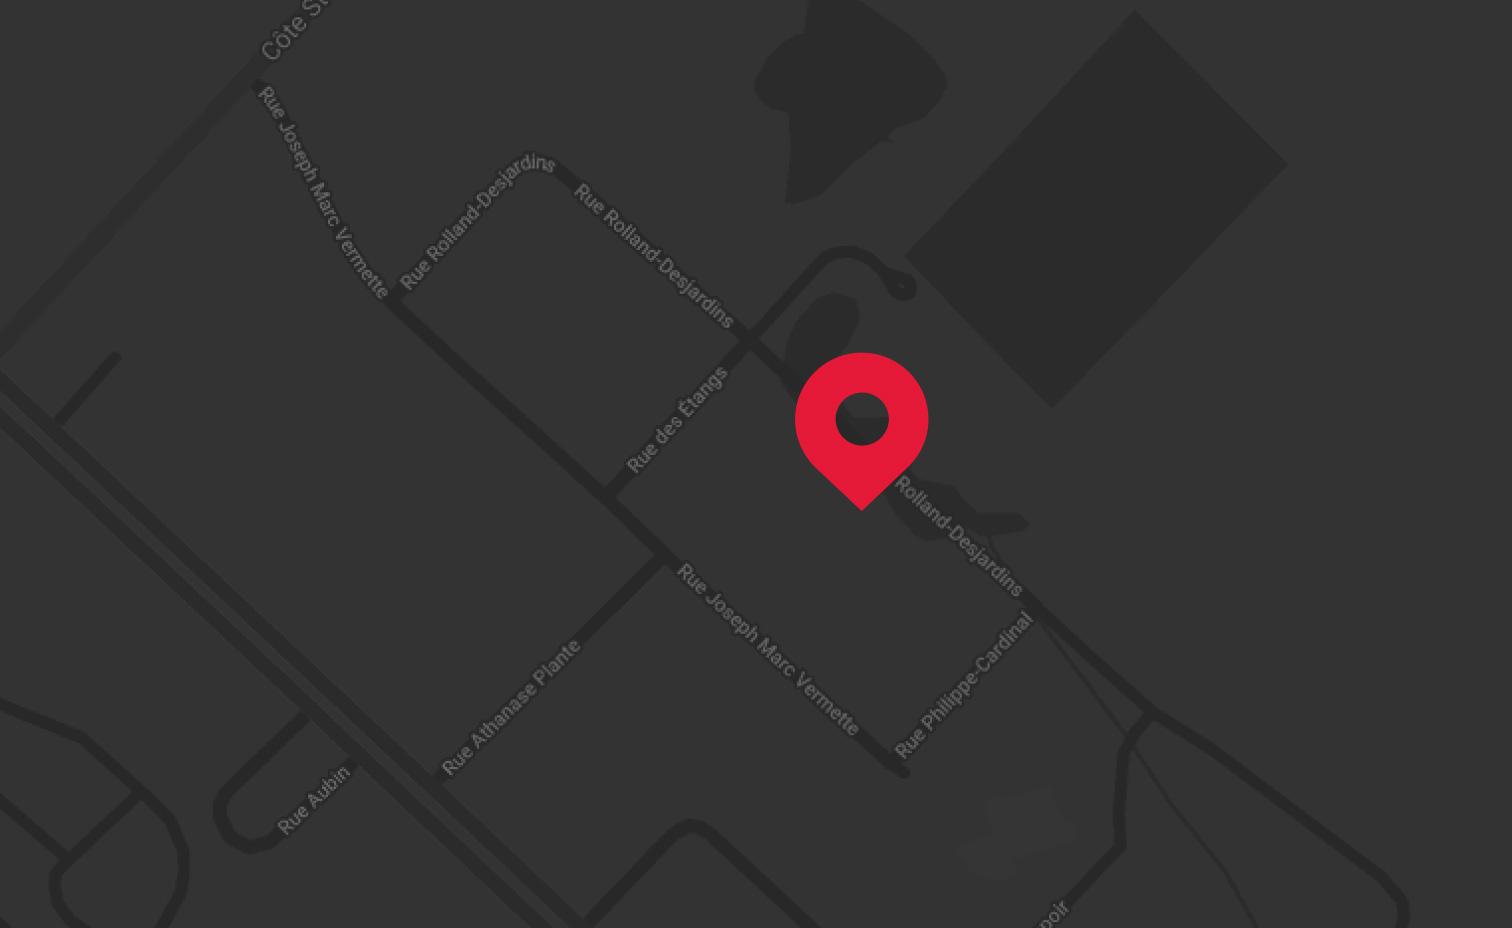 itinéraire 14519 Rue Joseph Marc Vermette, Mirabel, QC J7J 1X2